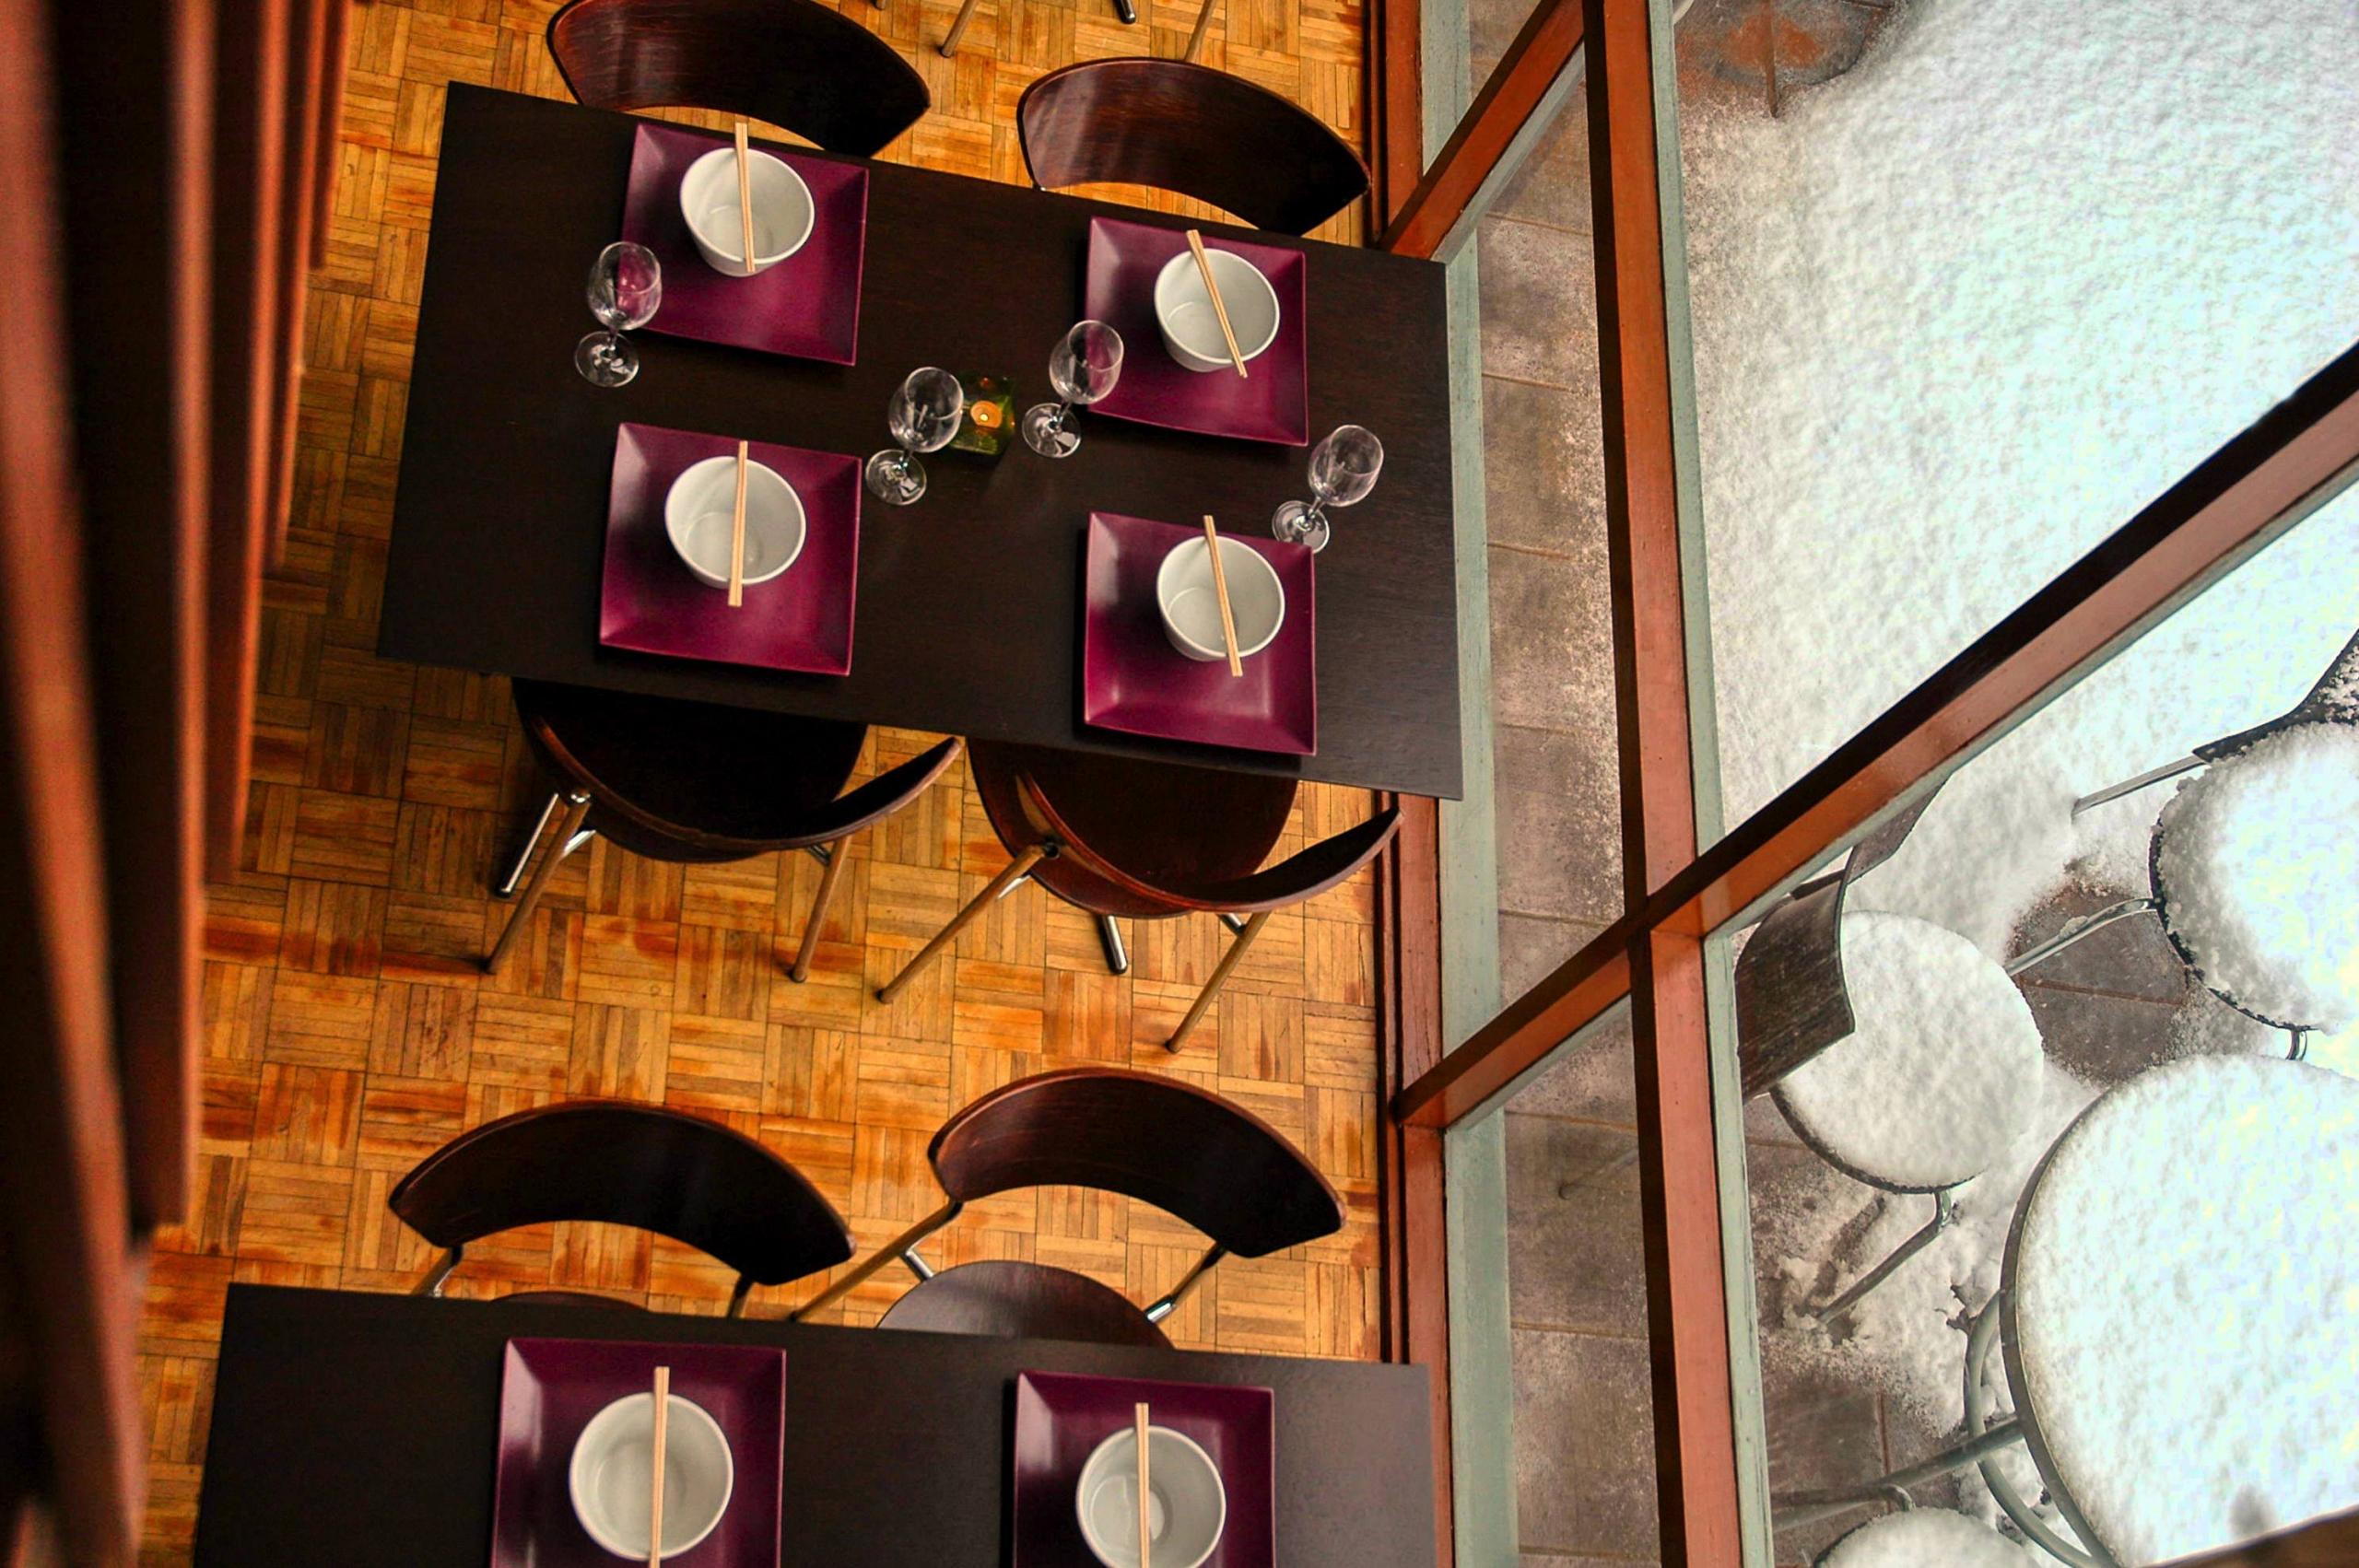 D1-Thredbo-Alpenhorn-Guest-House-BB-Hotel-Restaurant-see-alphorn.com_.au-50-scaled